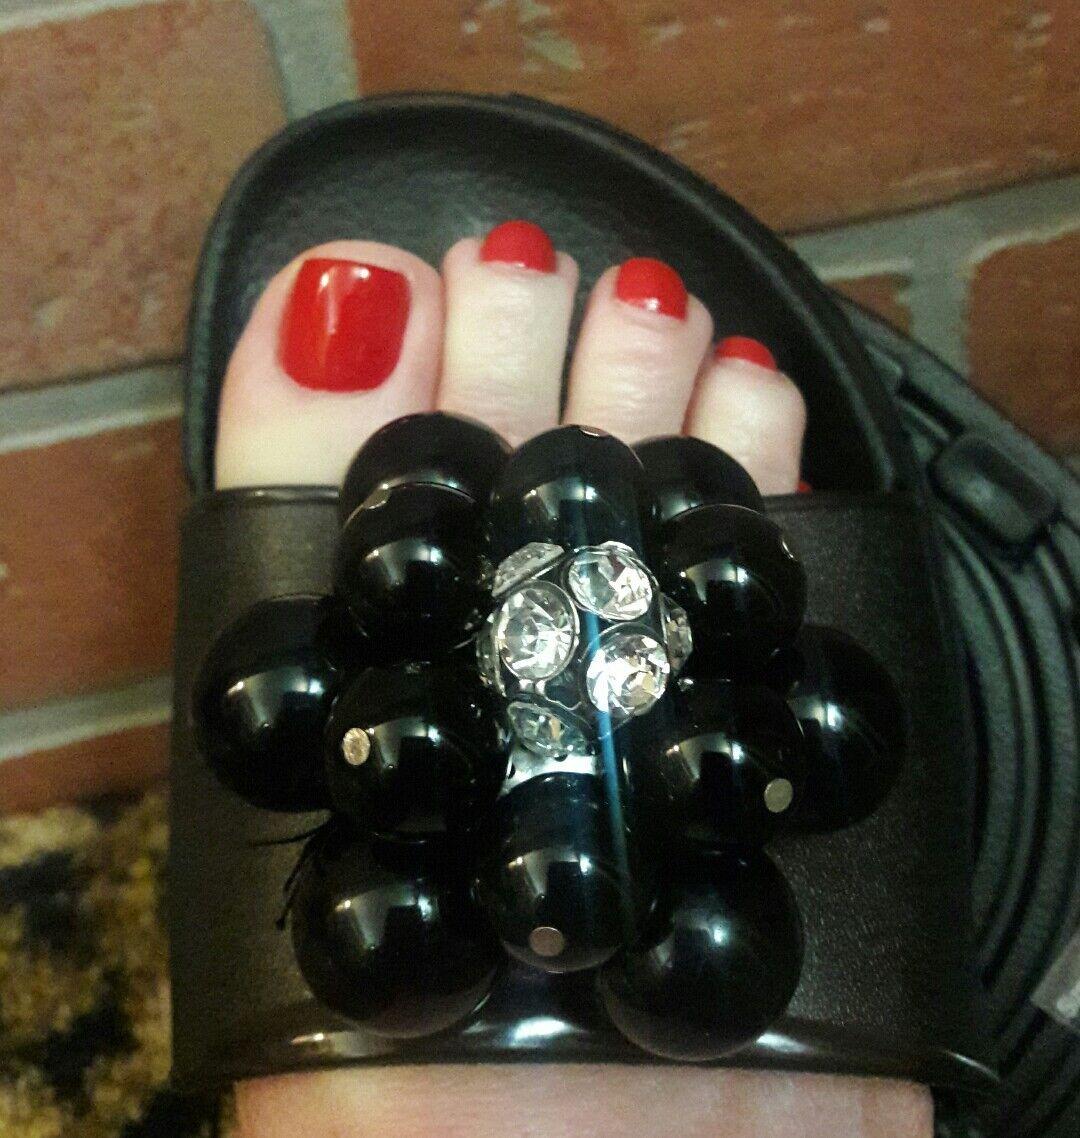 MISS TRISH OF CAPRI Black Rhinestone Womens Sandals 6 Flip Flops Beaded Shoes 6 Sandals M b50618